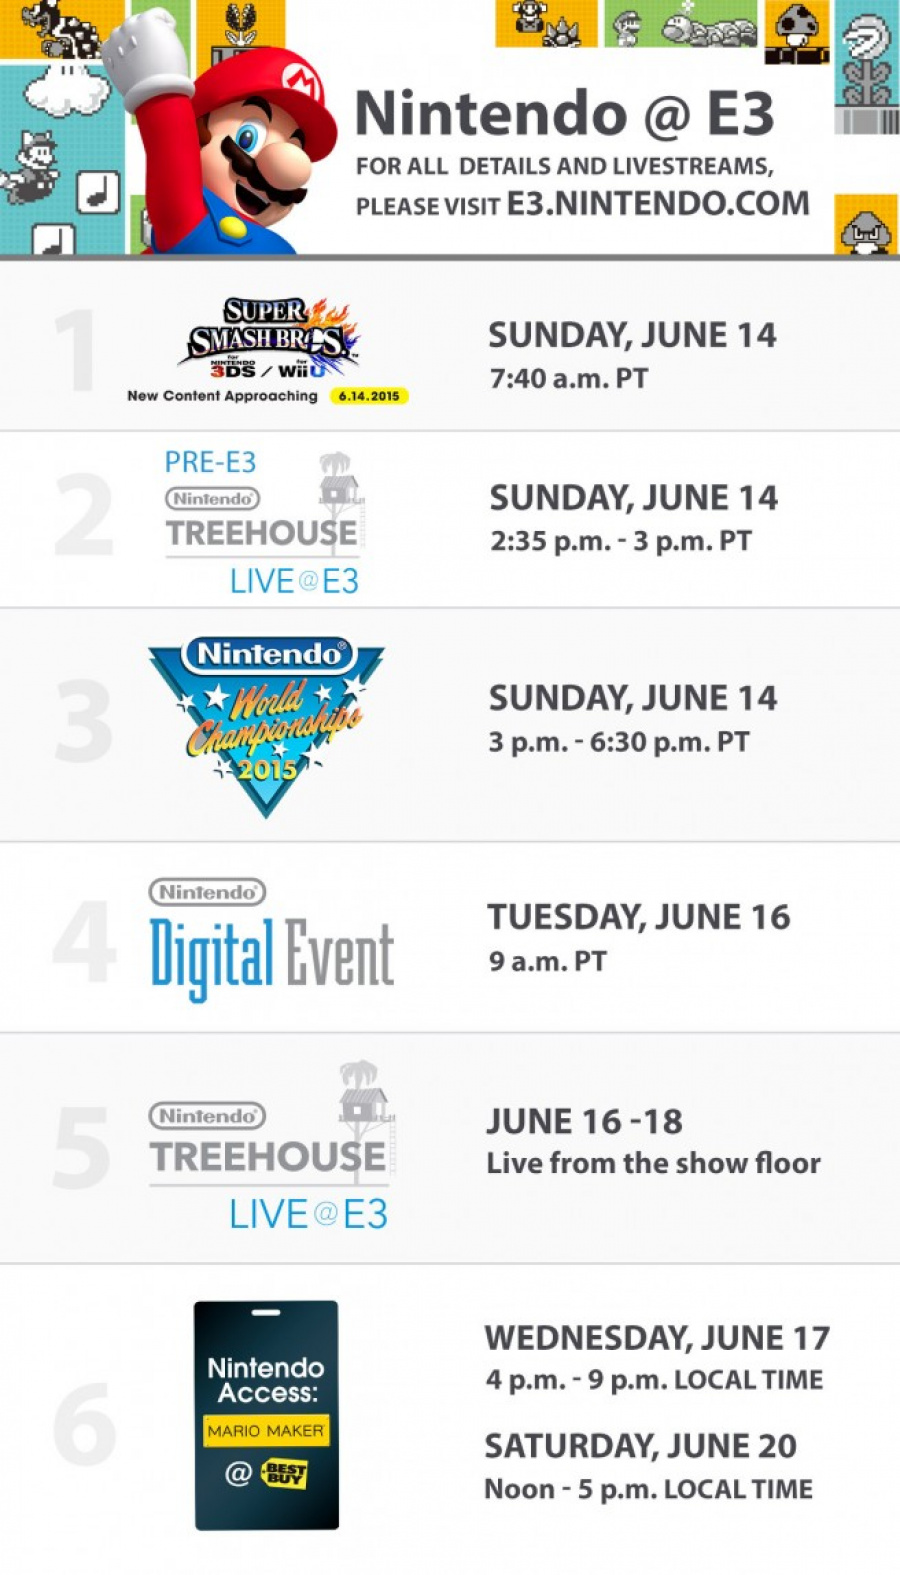 Nintendo E3 2015 Schedule 656 X1148